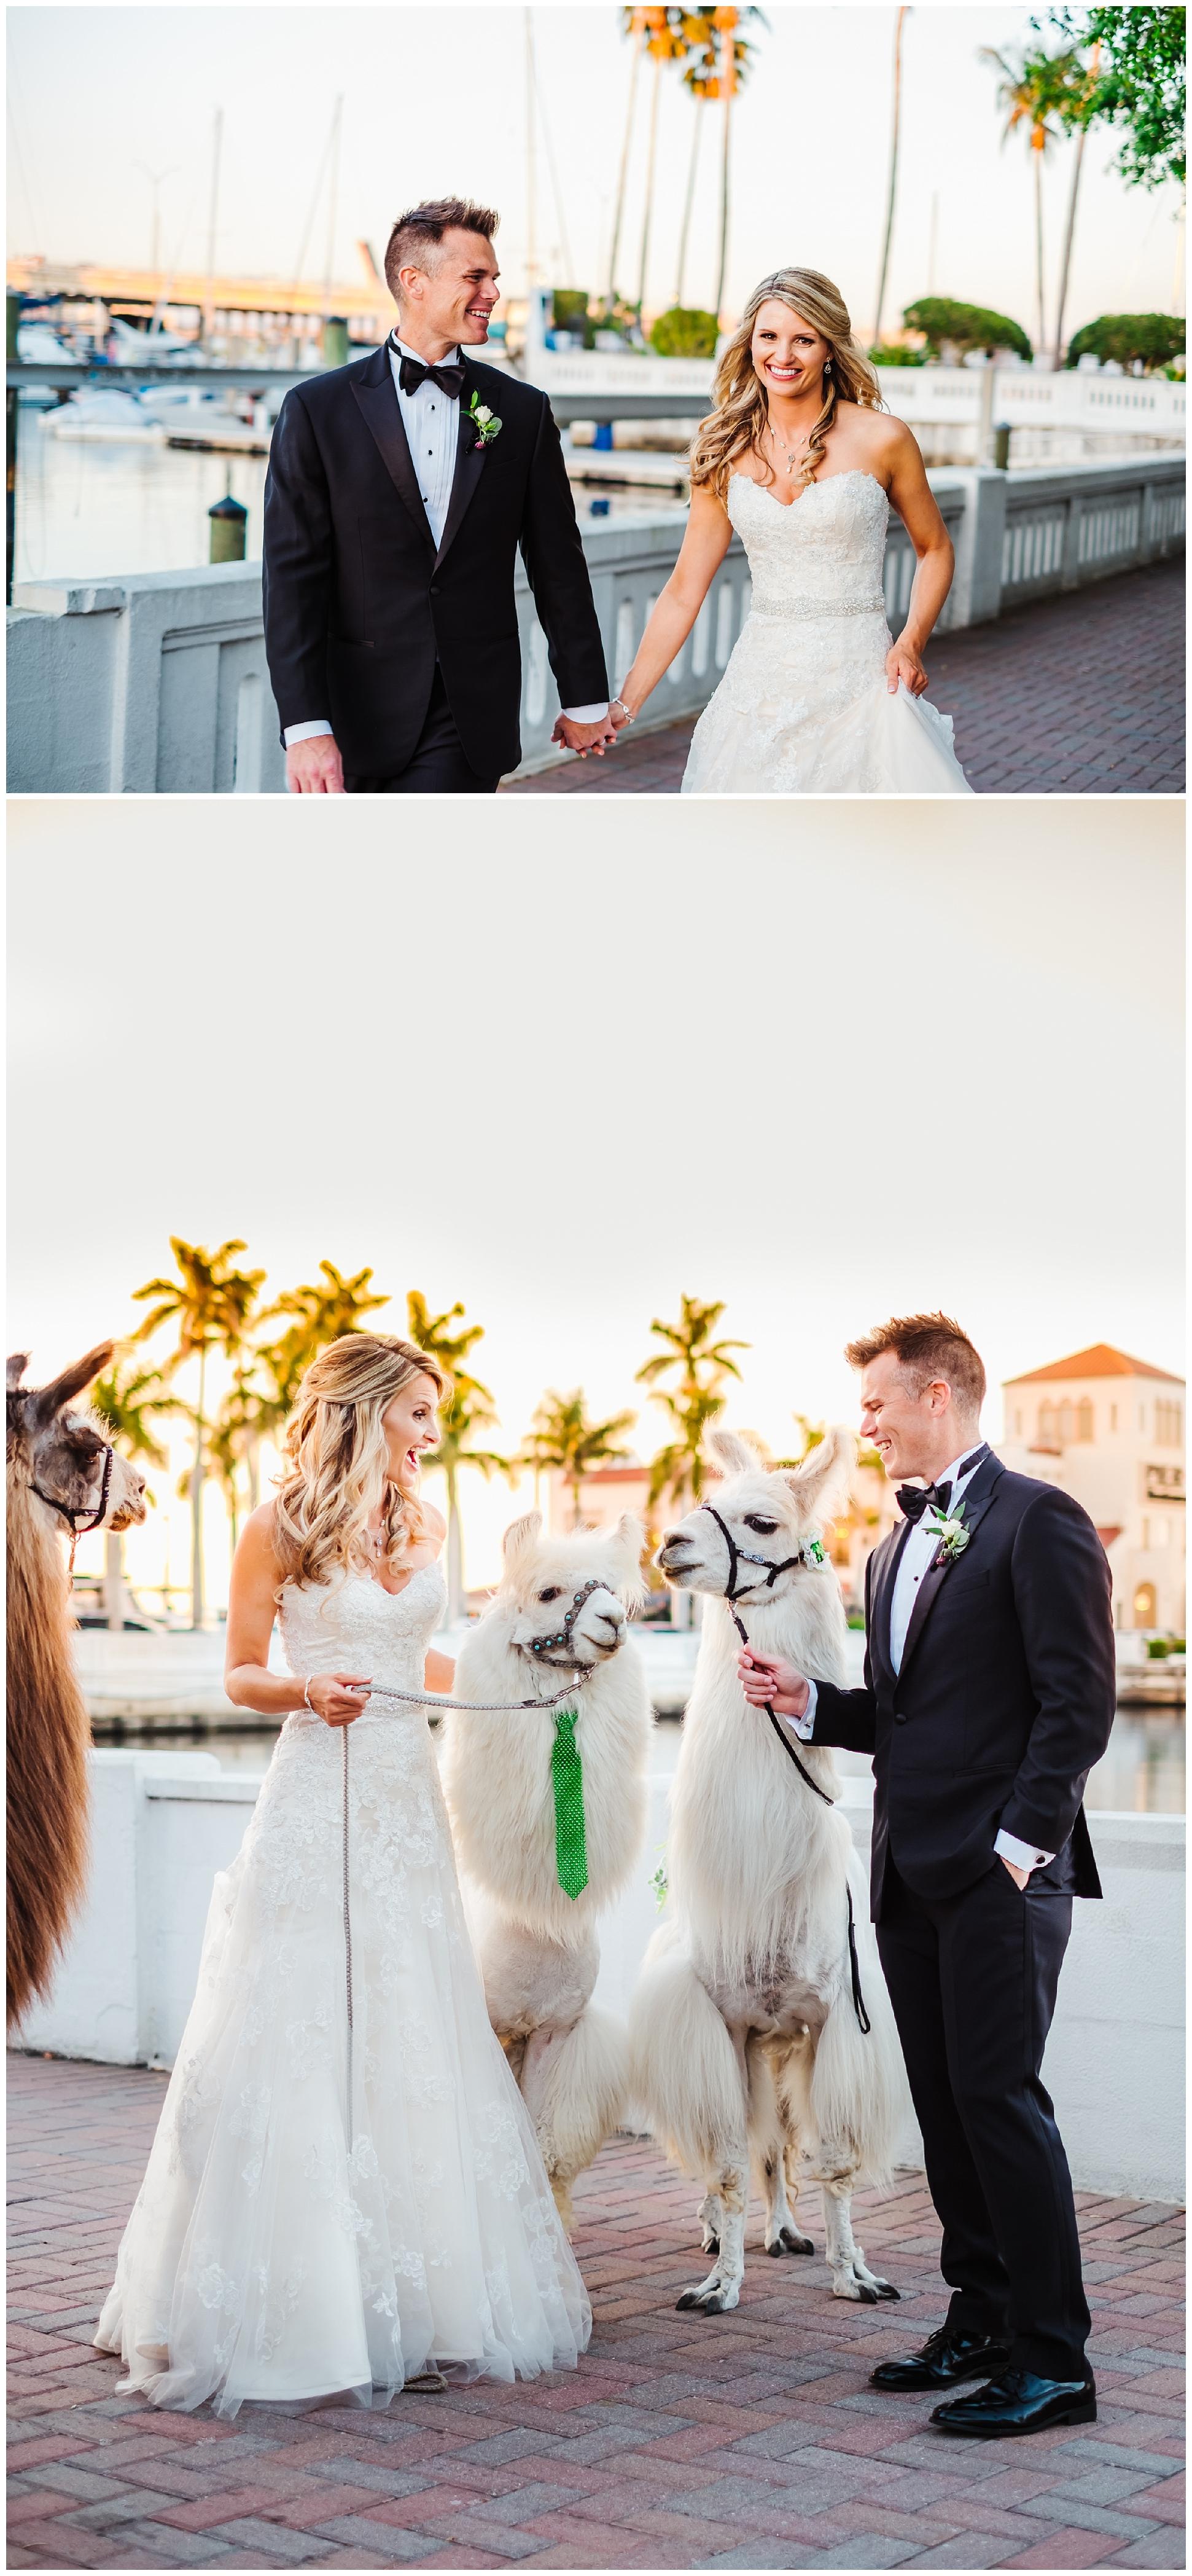 tampa-bradenton-wedding-photographer-south-florida-museum-classic-blush-gold-alpacas-sparklers_0076.jpg